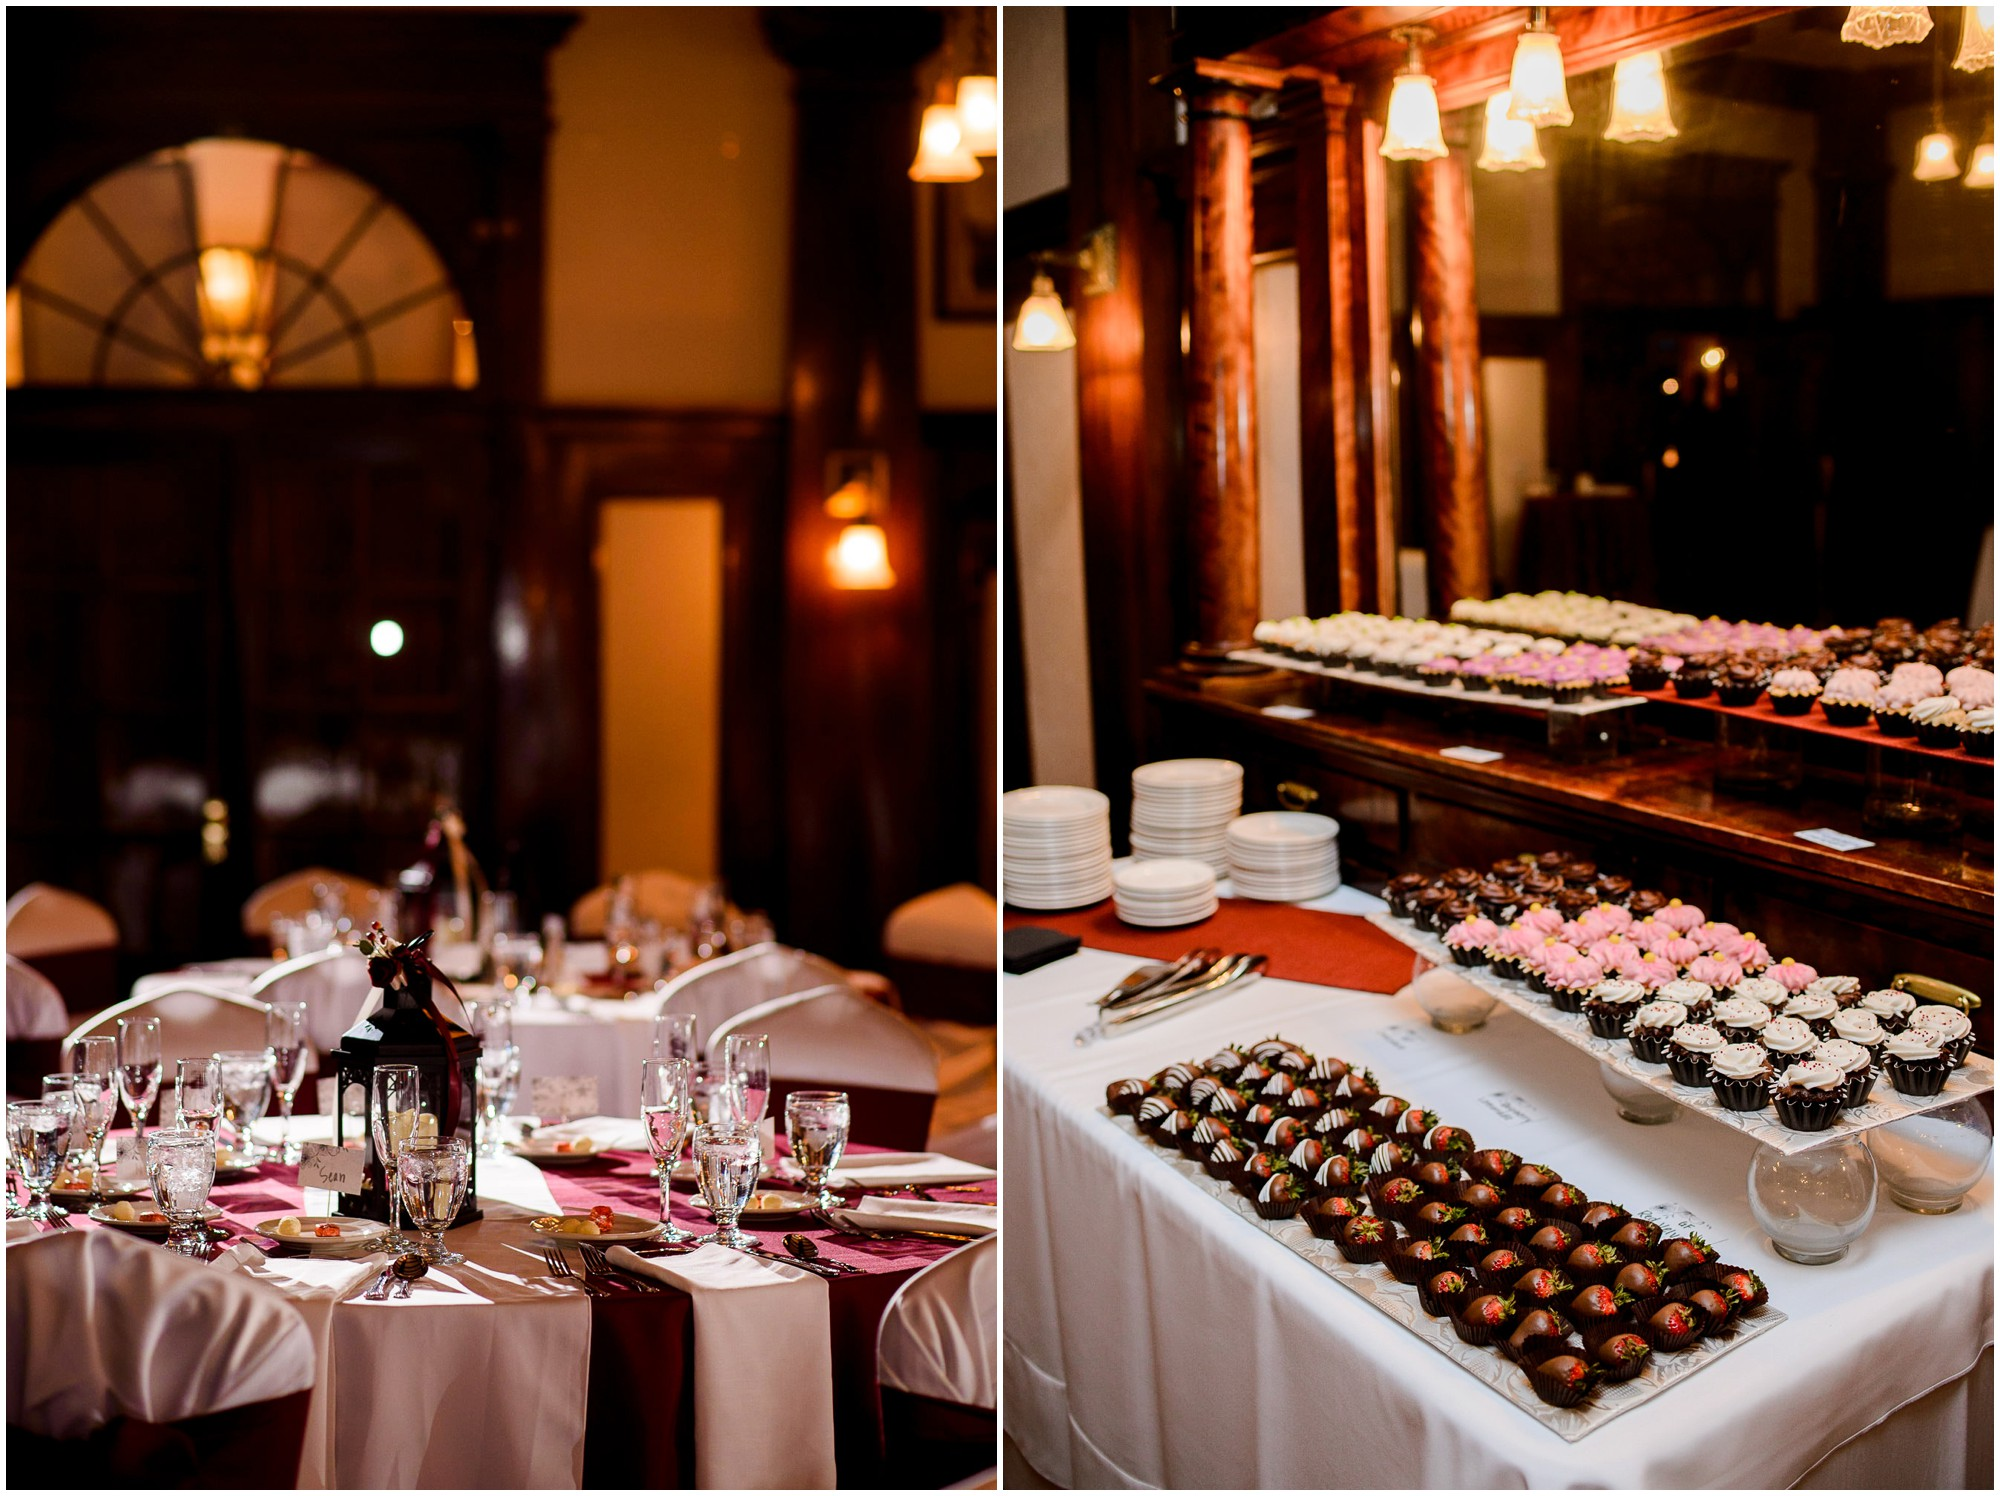 212-Estes-Park-Stanley-hotel-fall-wedding.jpg